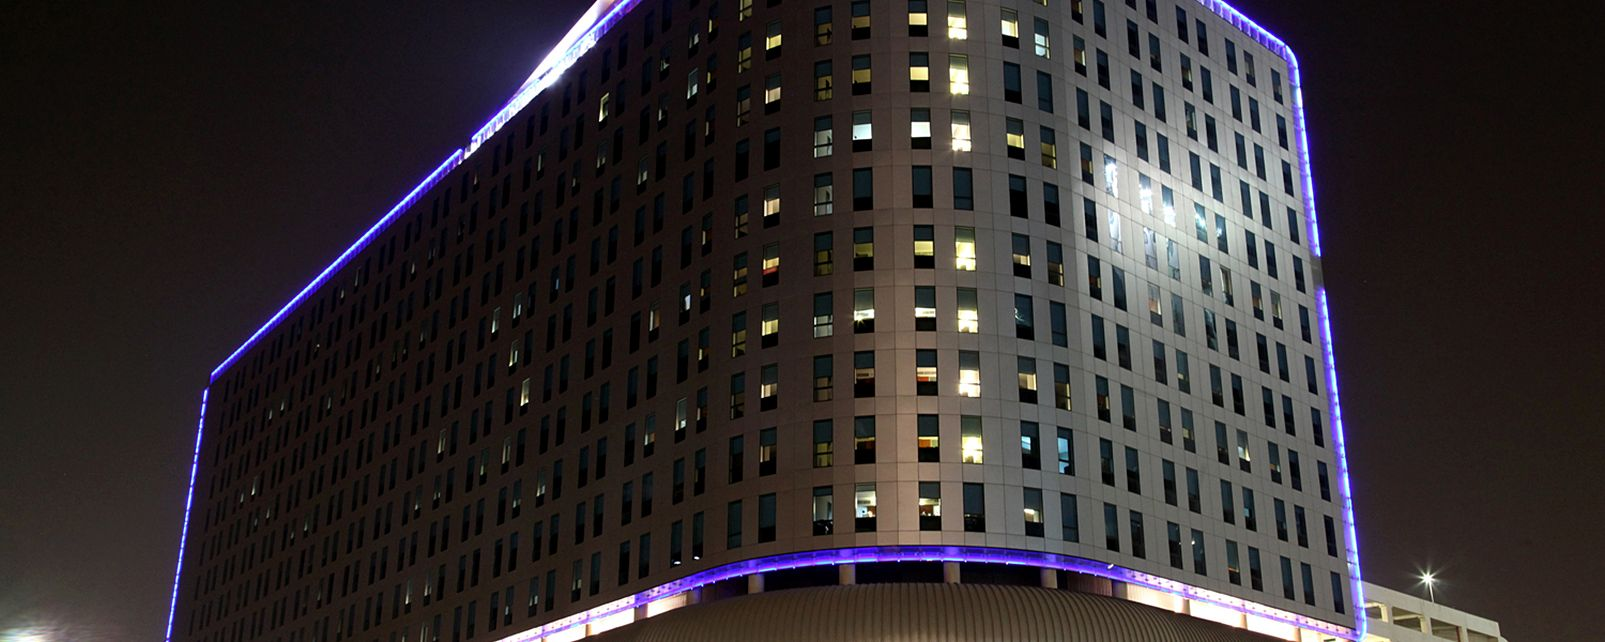 Hôtel Aloft Abu Dhabi